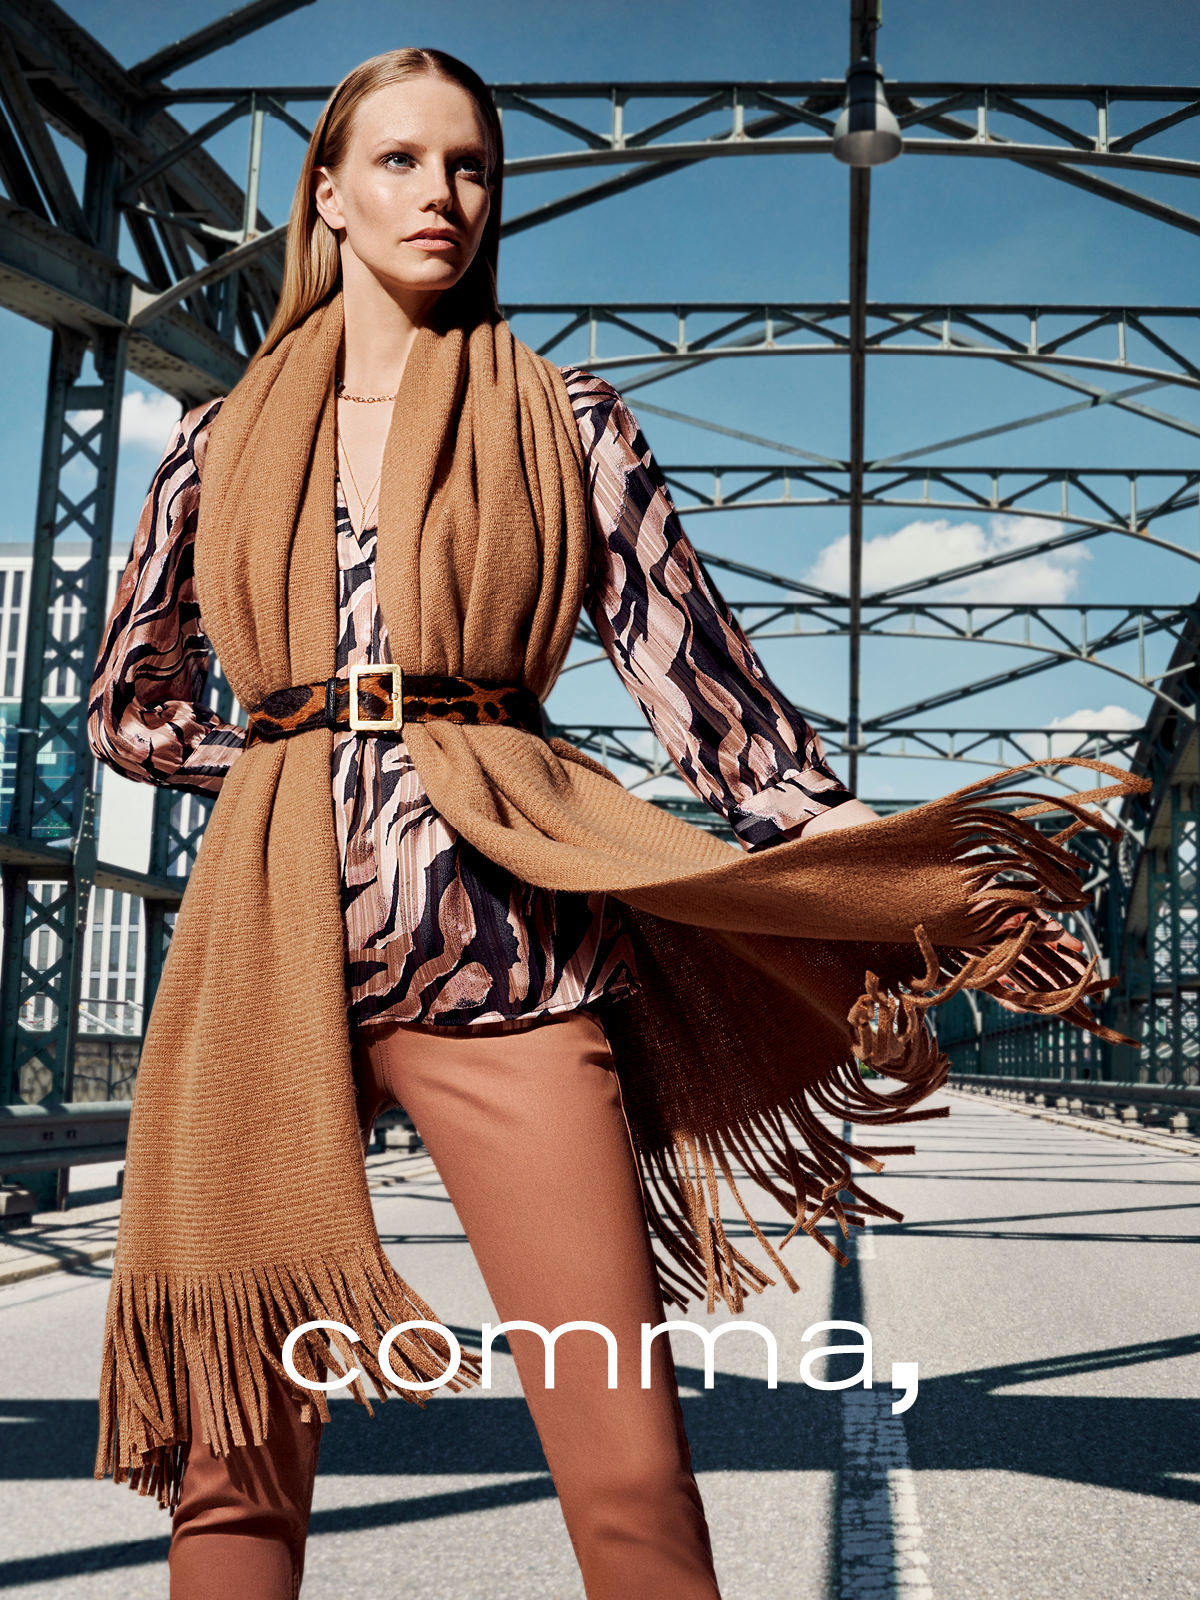 ncm-boutique-damenbekleidung-damenmode-heerbrugg-st.-gallen-comma-herbst-winter-2020